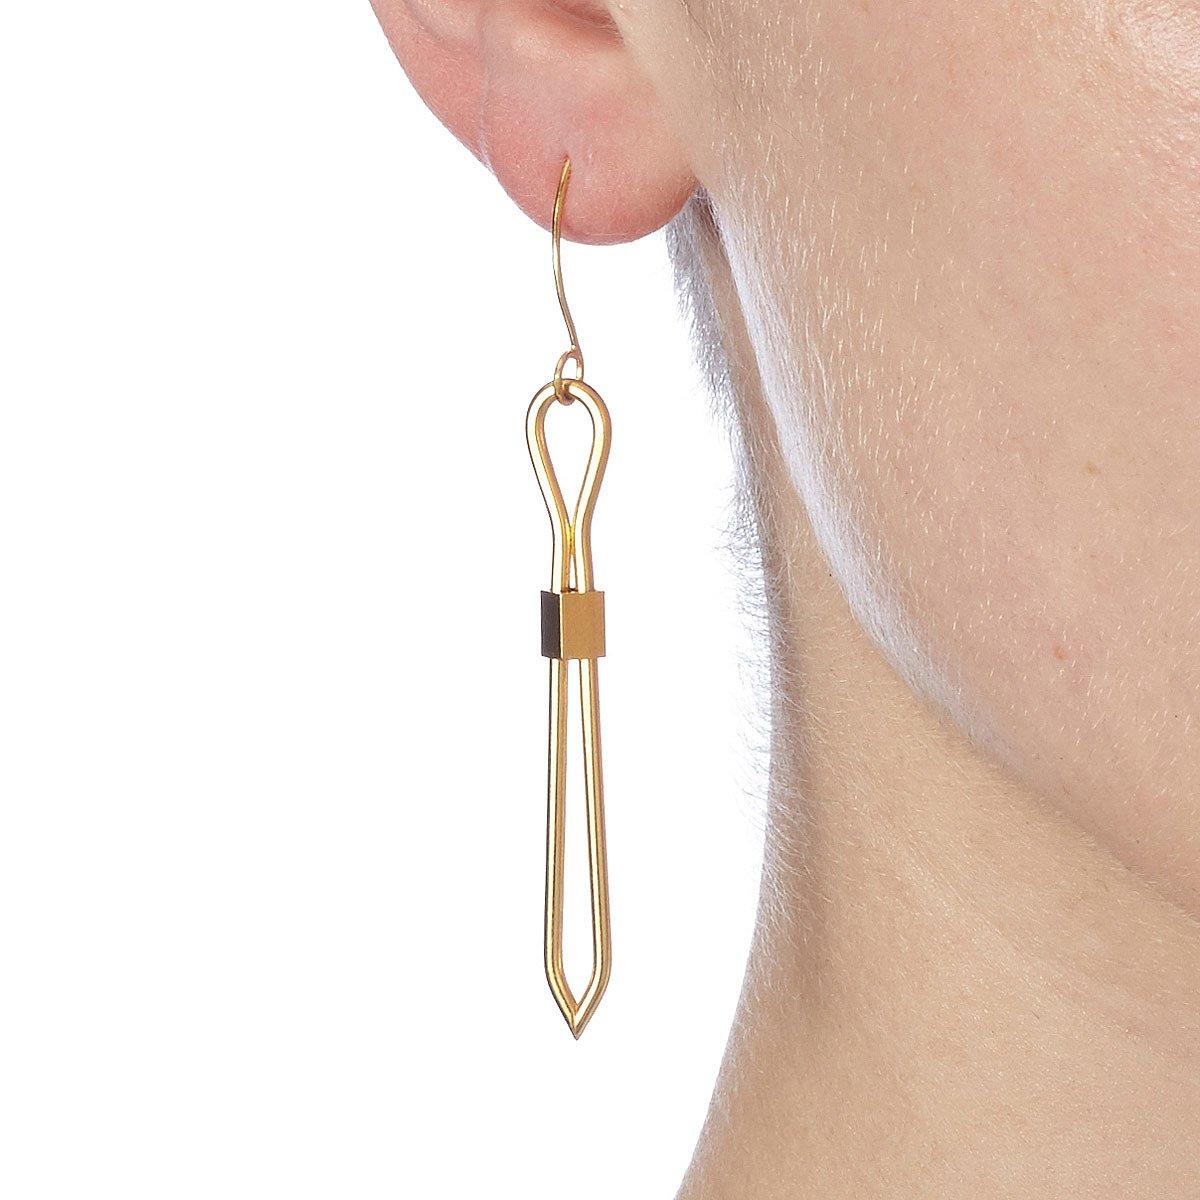 s earrings deco jewelry roach uncommongoods